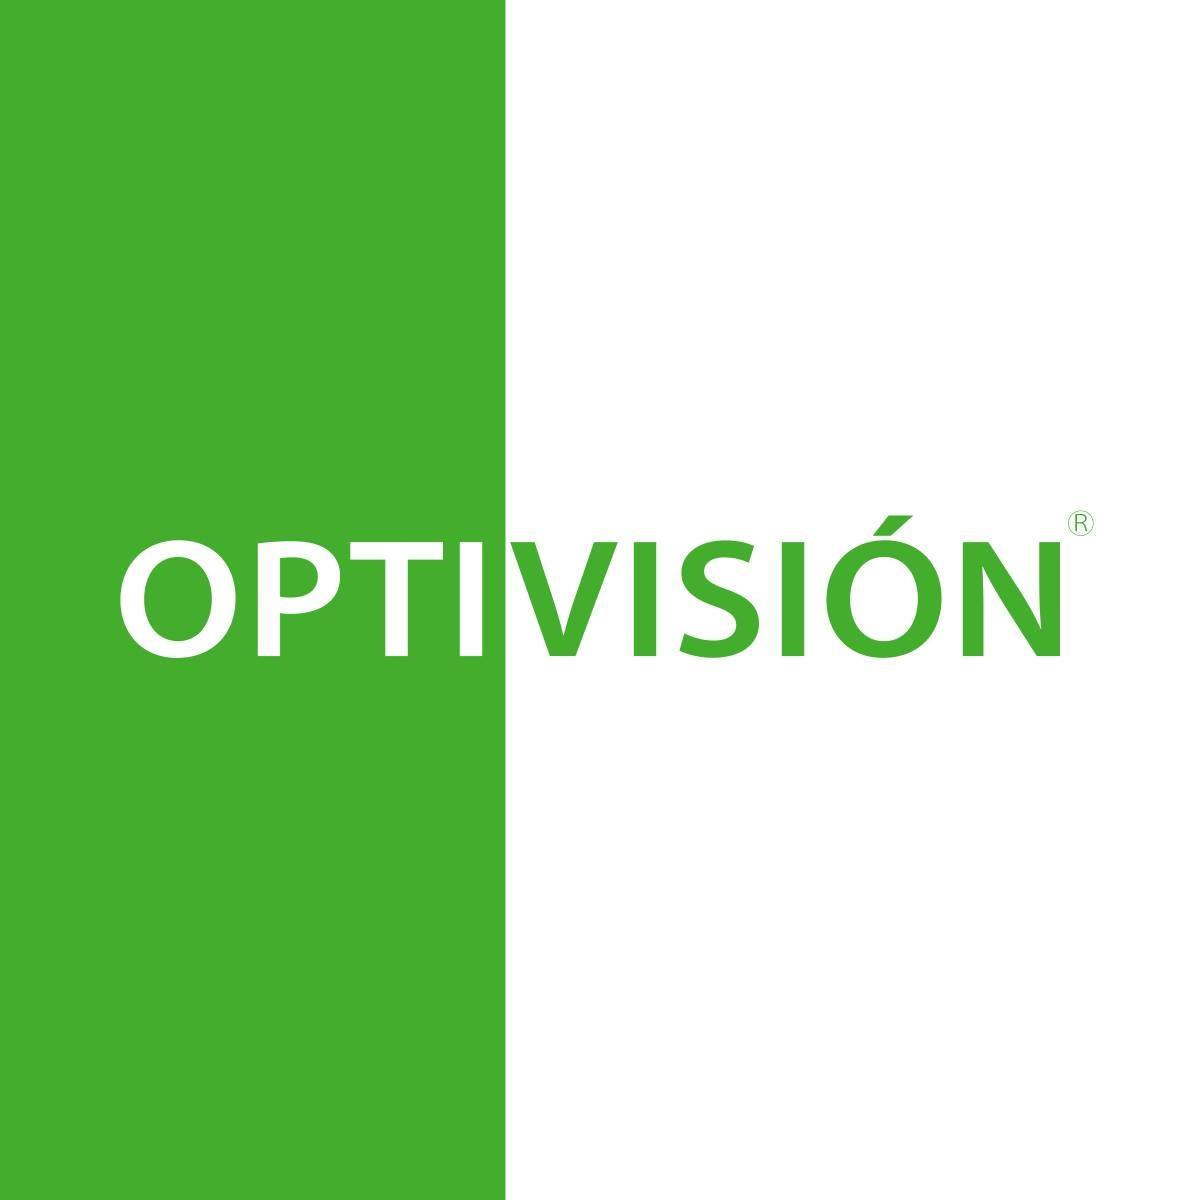 Centro óptico optivisión,tu óptica de confianza en Móstoles